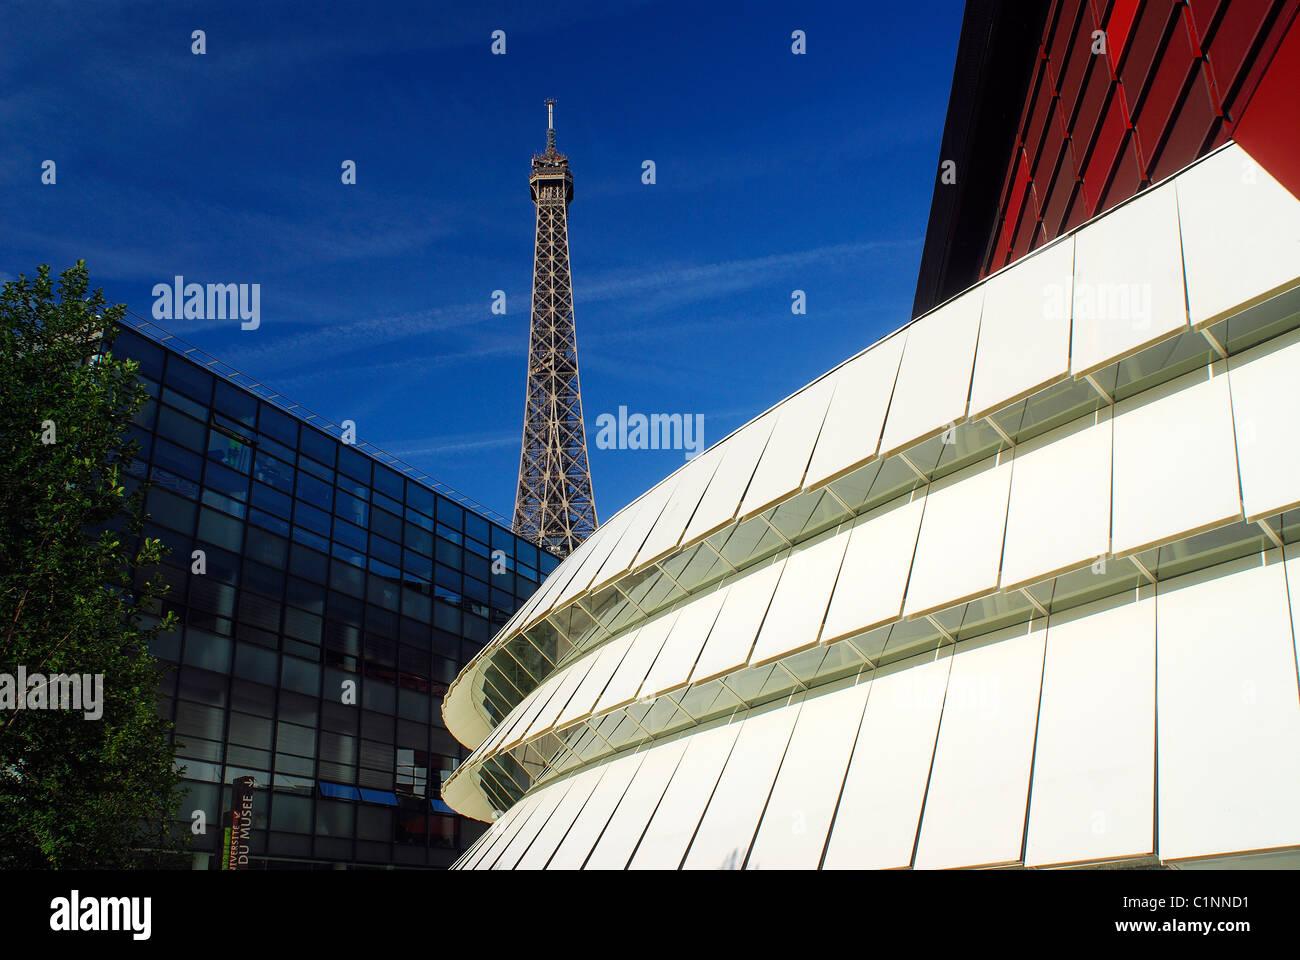 France, Paris, Quai Branly Museum (anthropological museum) by Jean Nouvel - Stock Image